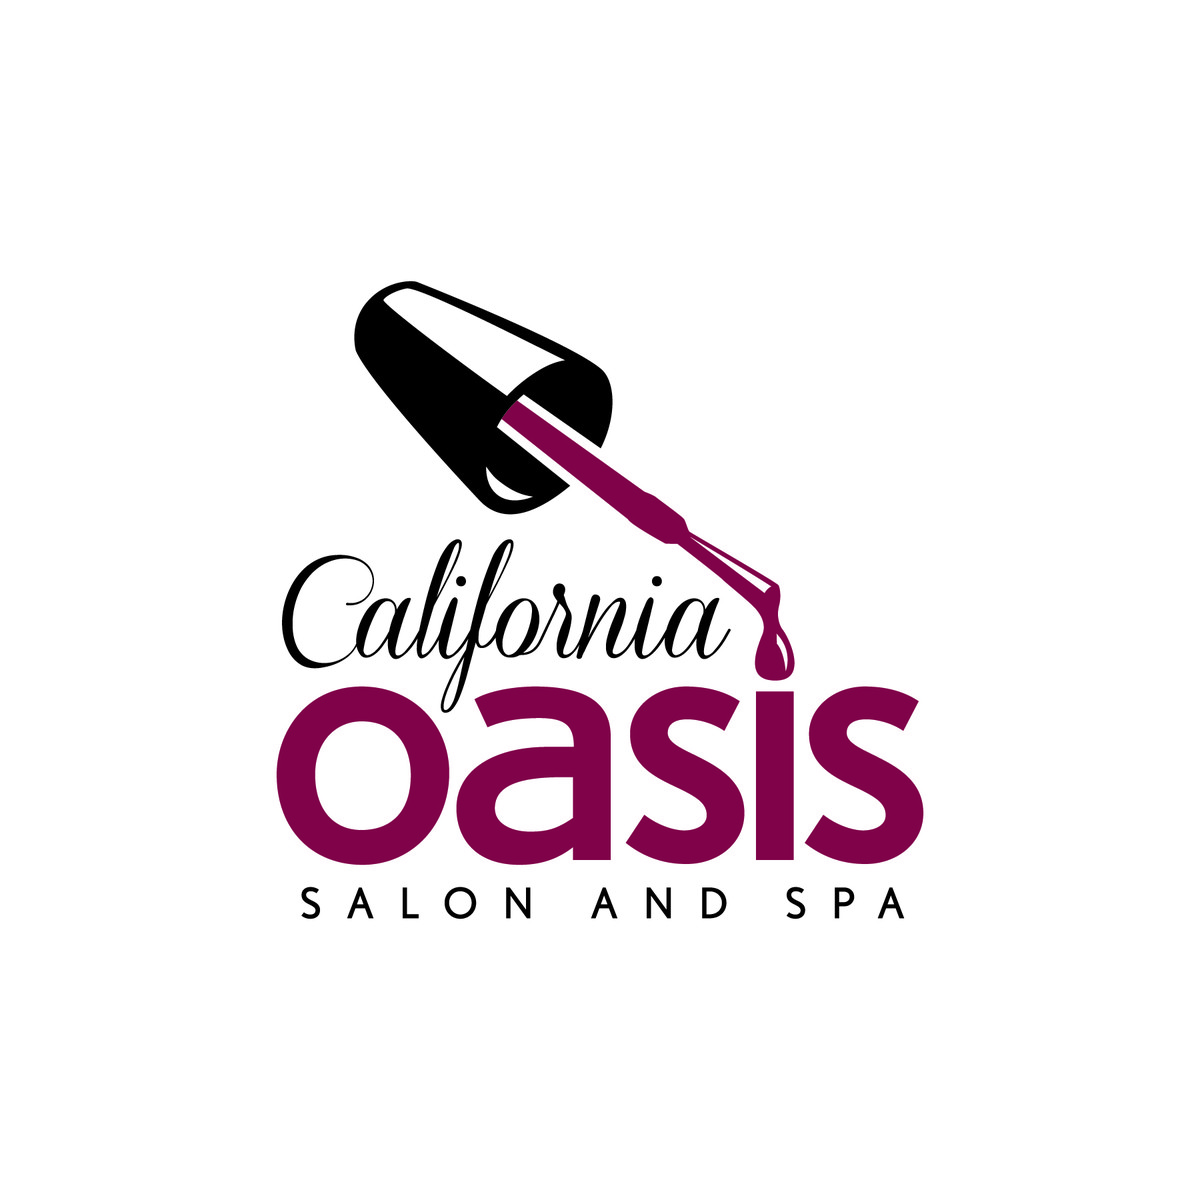 California Oasis Nail Salon Amp Spa Beauty Amp Health